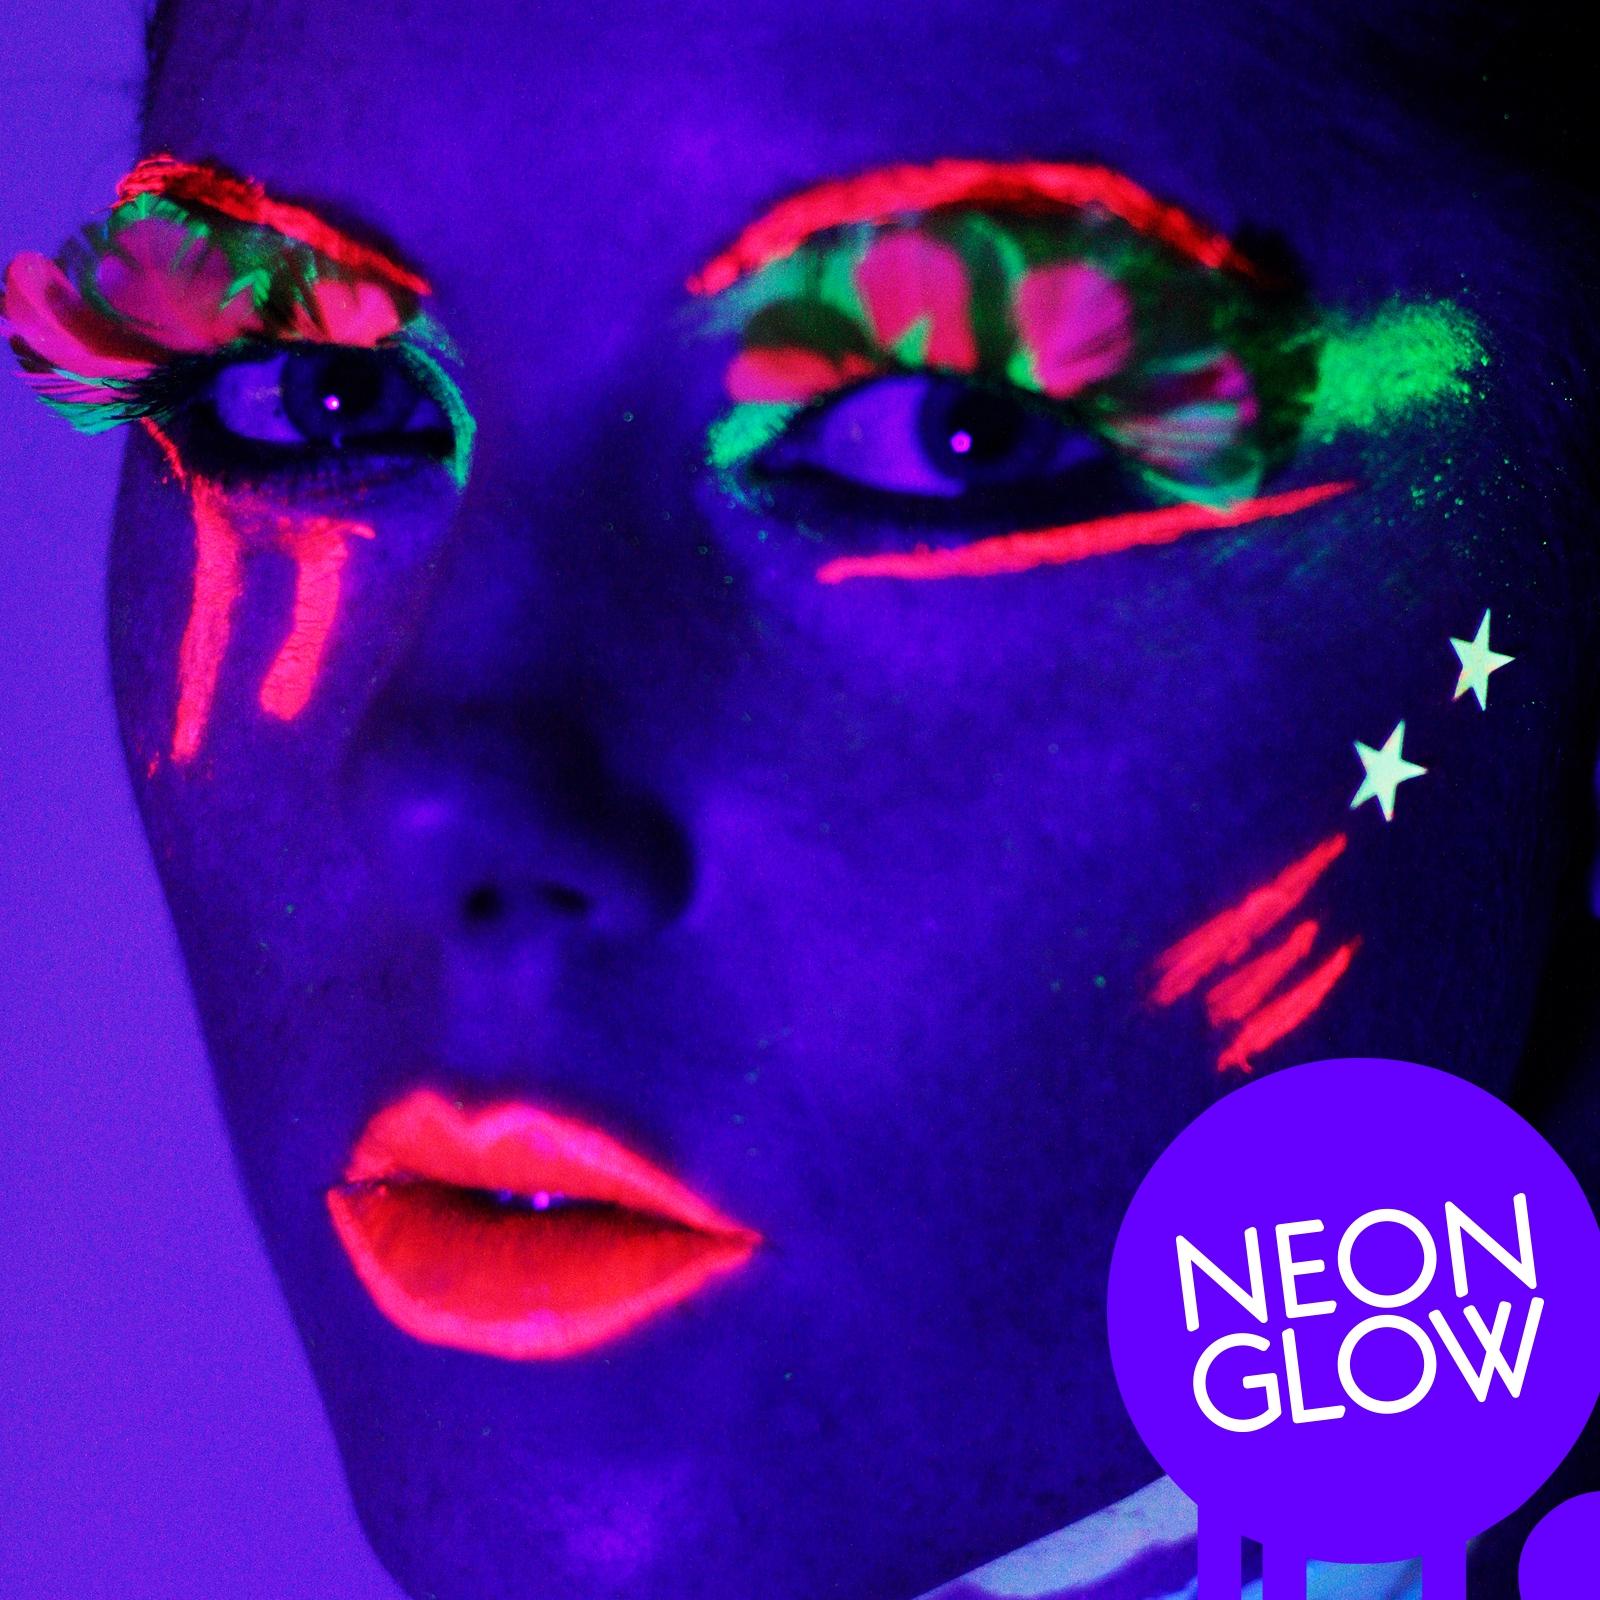 Global Colours BodyArt Fluorescent Neon Glow in the Dark